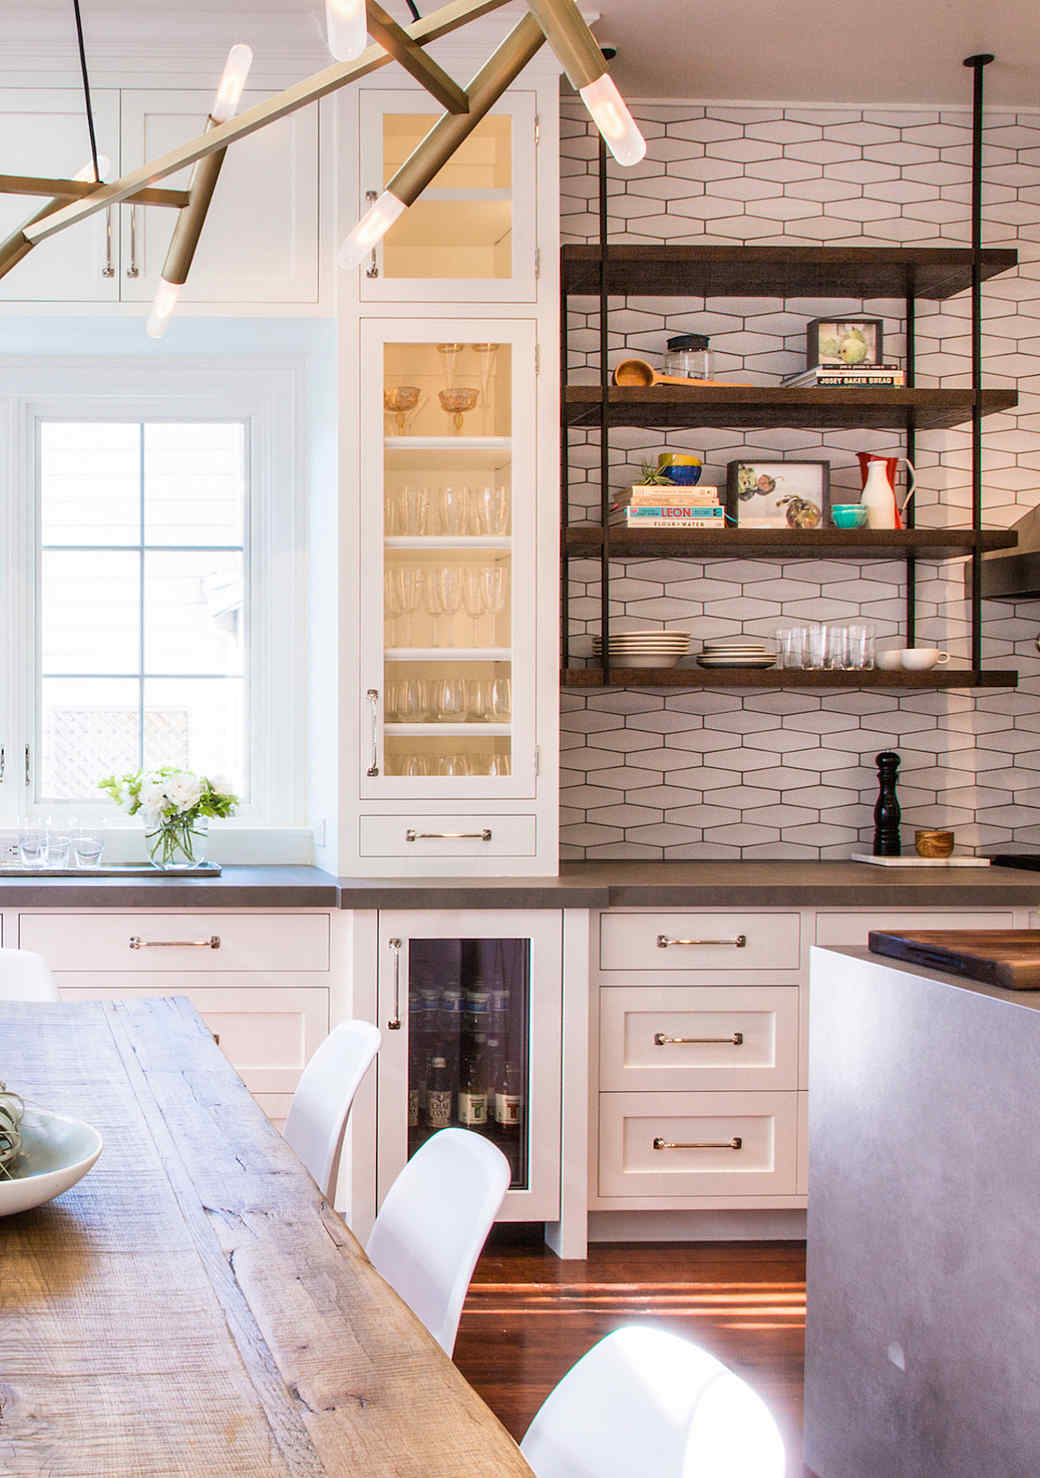 Pleasing Kitchen Design Ideas Martha Stewart Largest Home Design Picture Inspirations Pitcheantrous